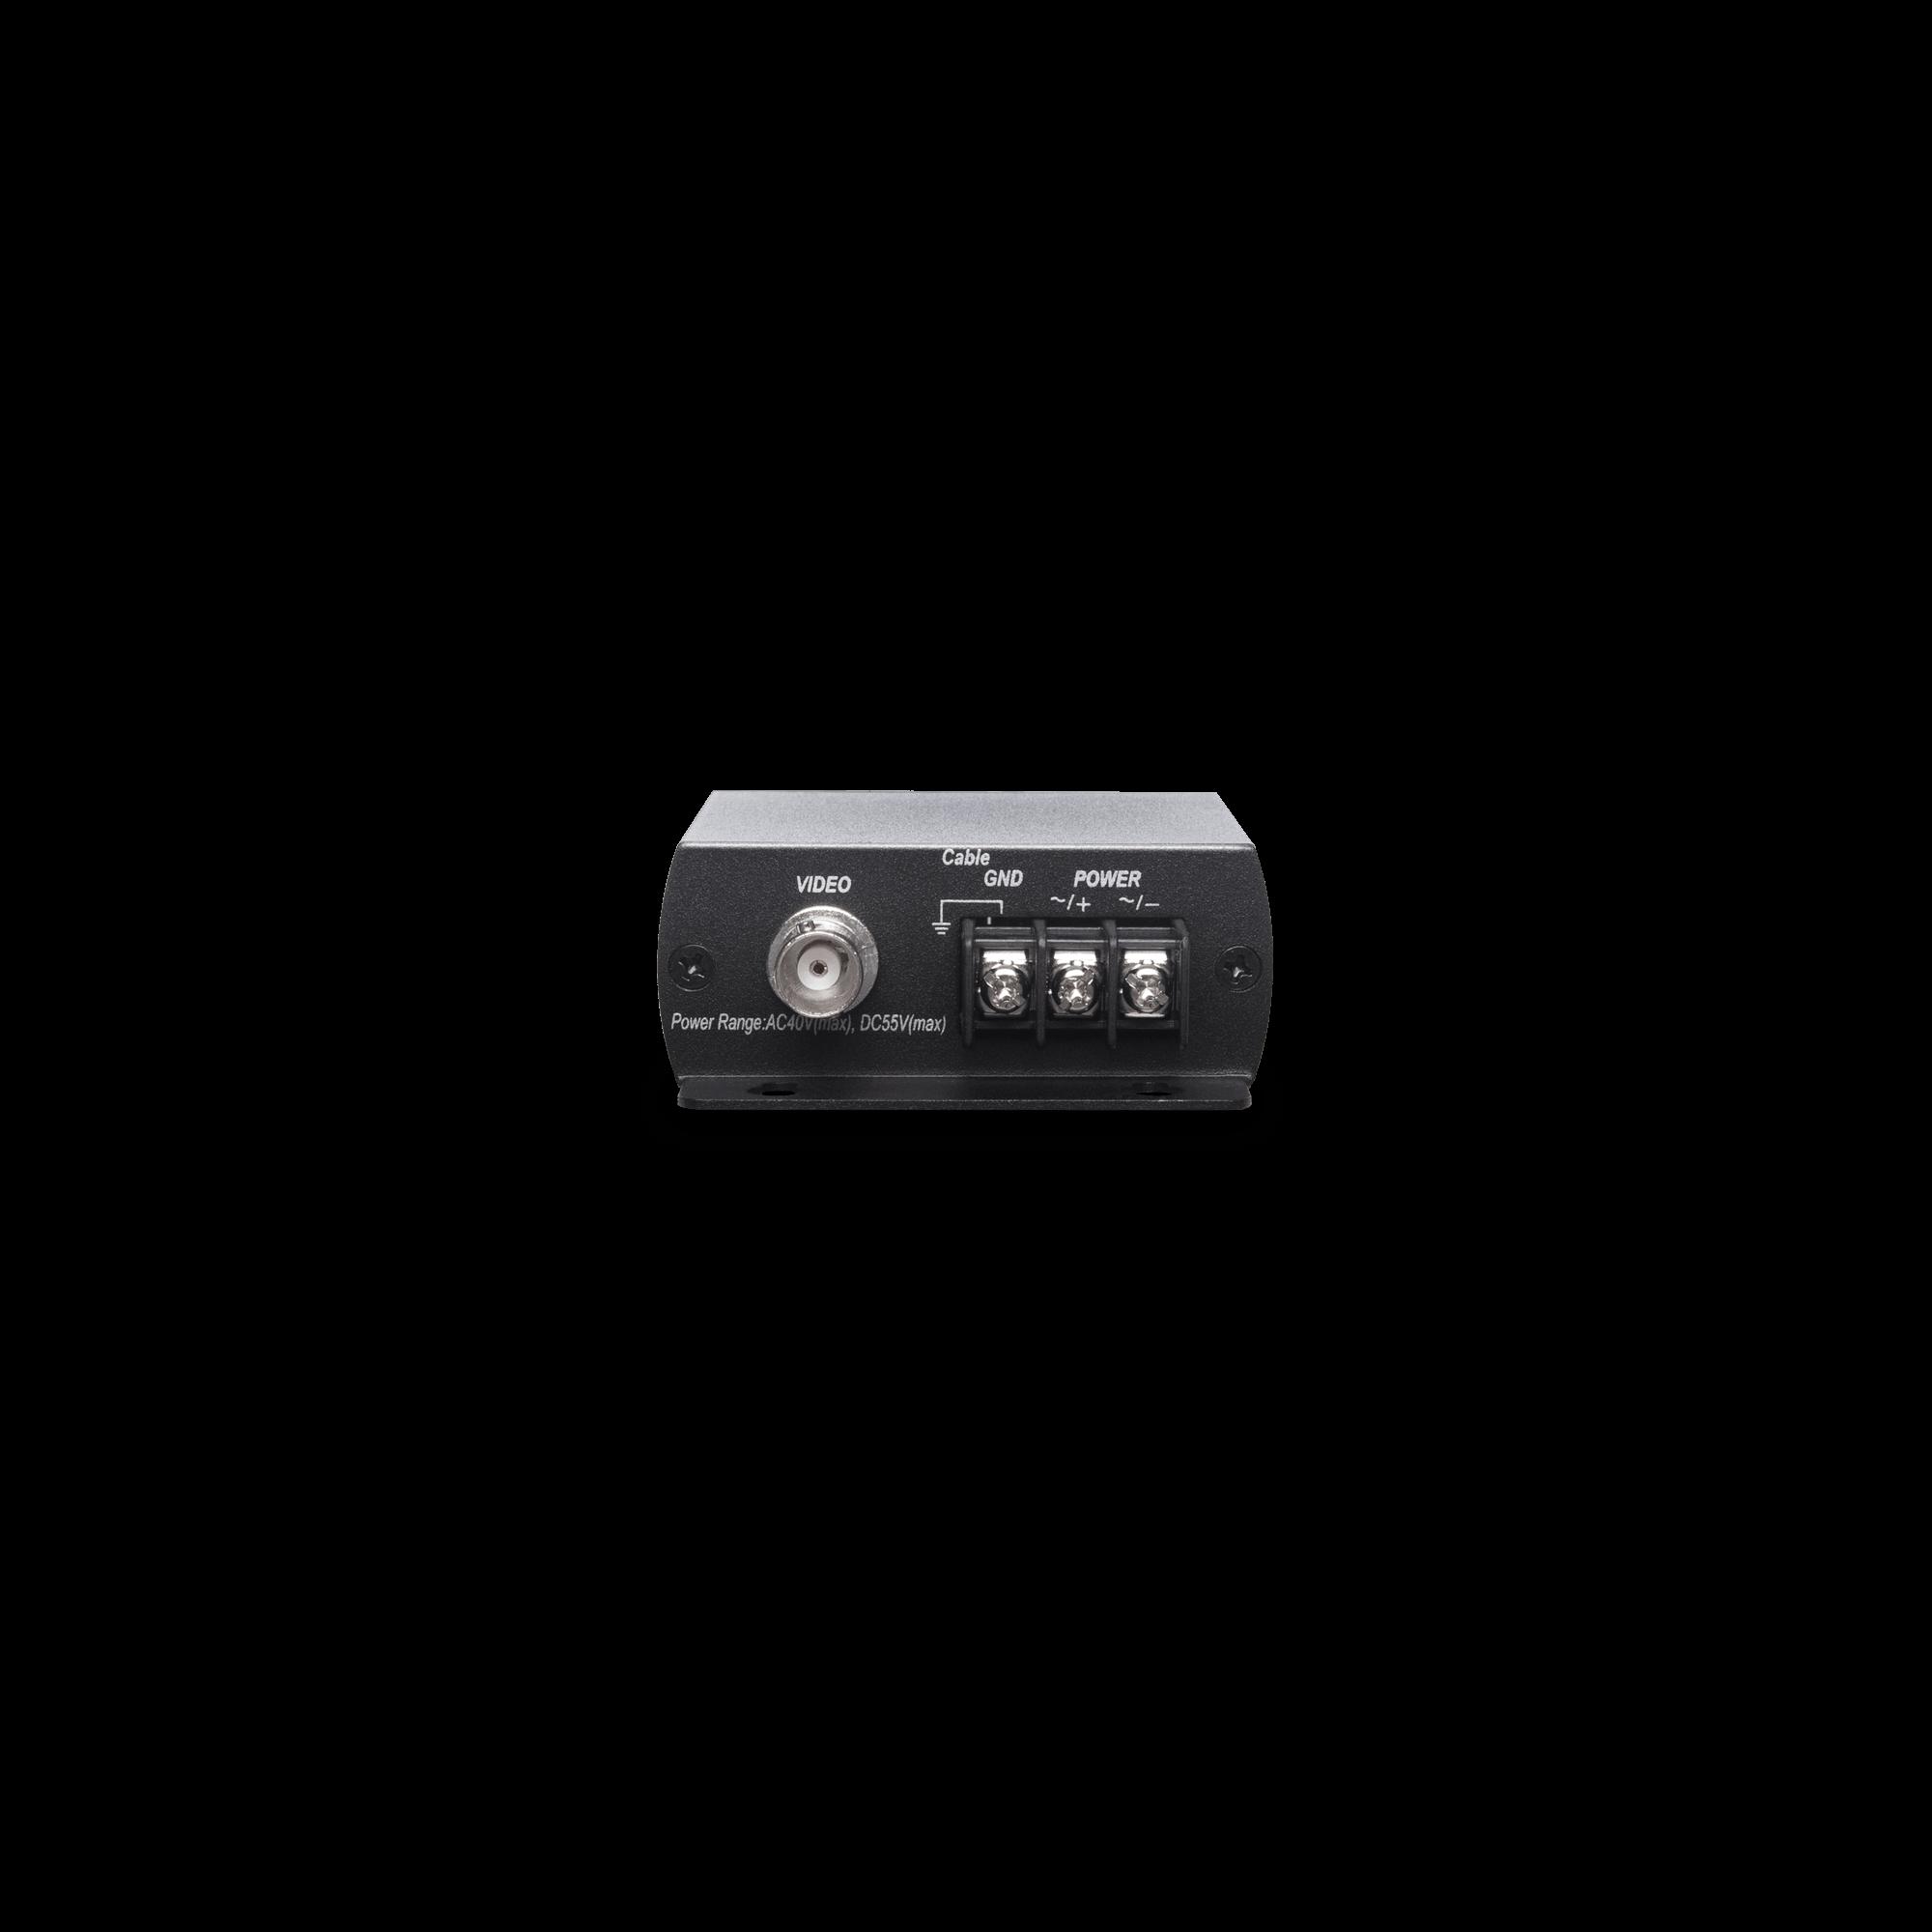 HD-TVI/AHD/HDCVI/CVBS & Power Surge Protector